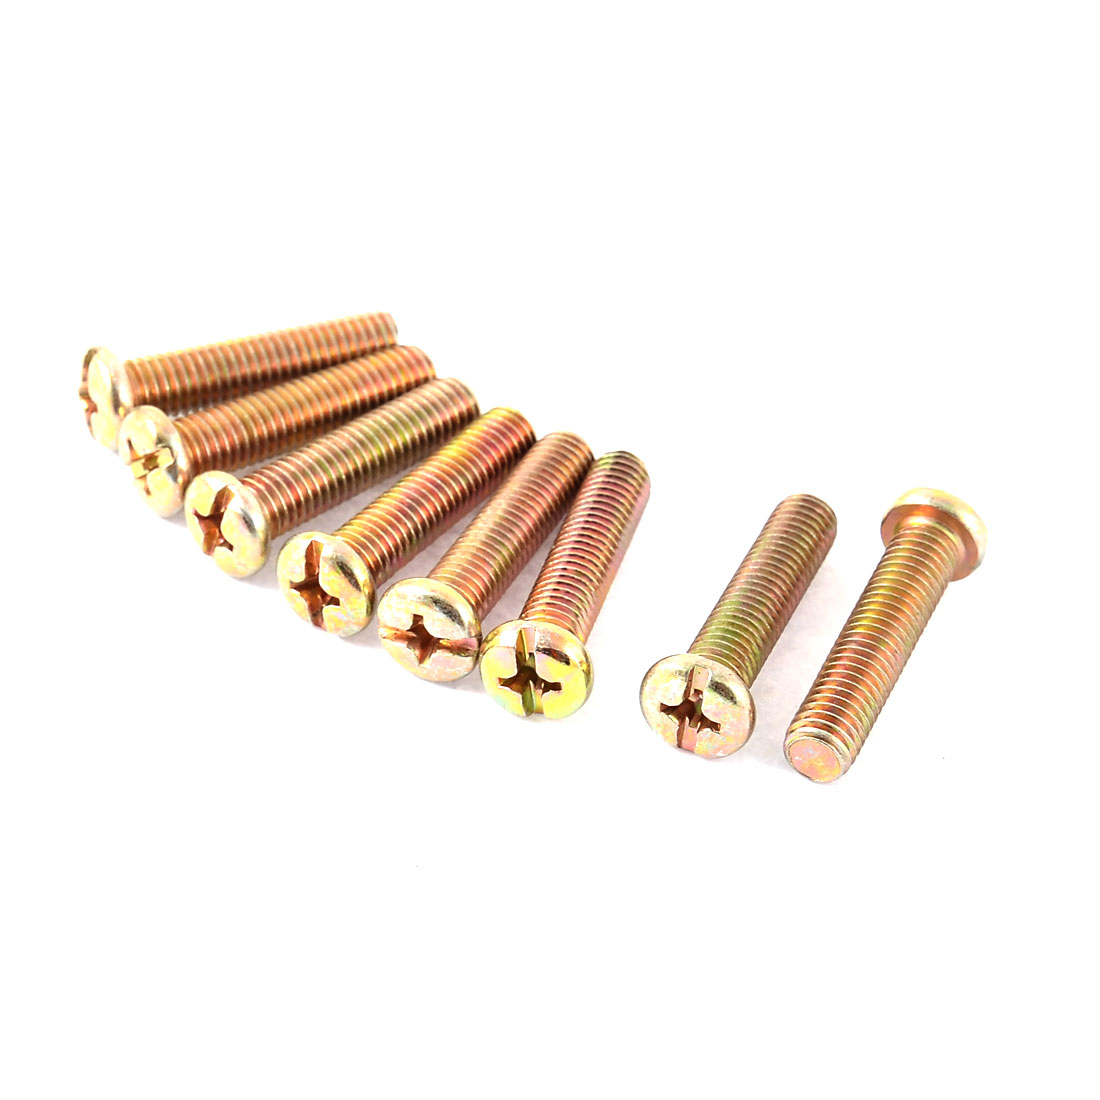 M8 x 35mm Full Thread Phillips Round Head Machine Screw Bolt Bronze Tone 8 Pcs